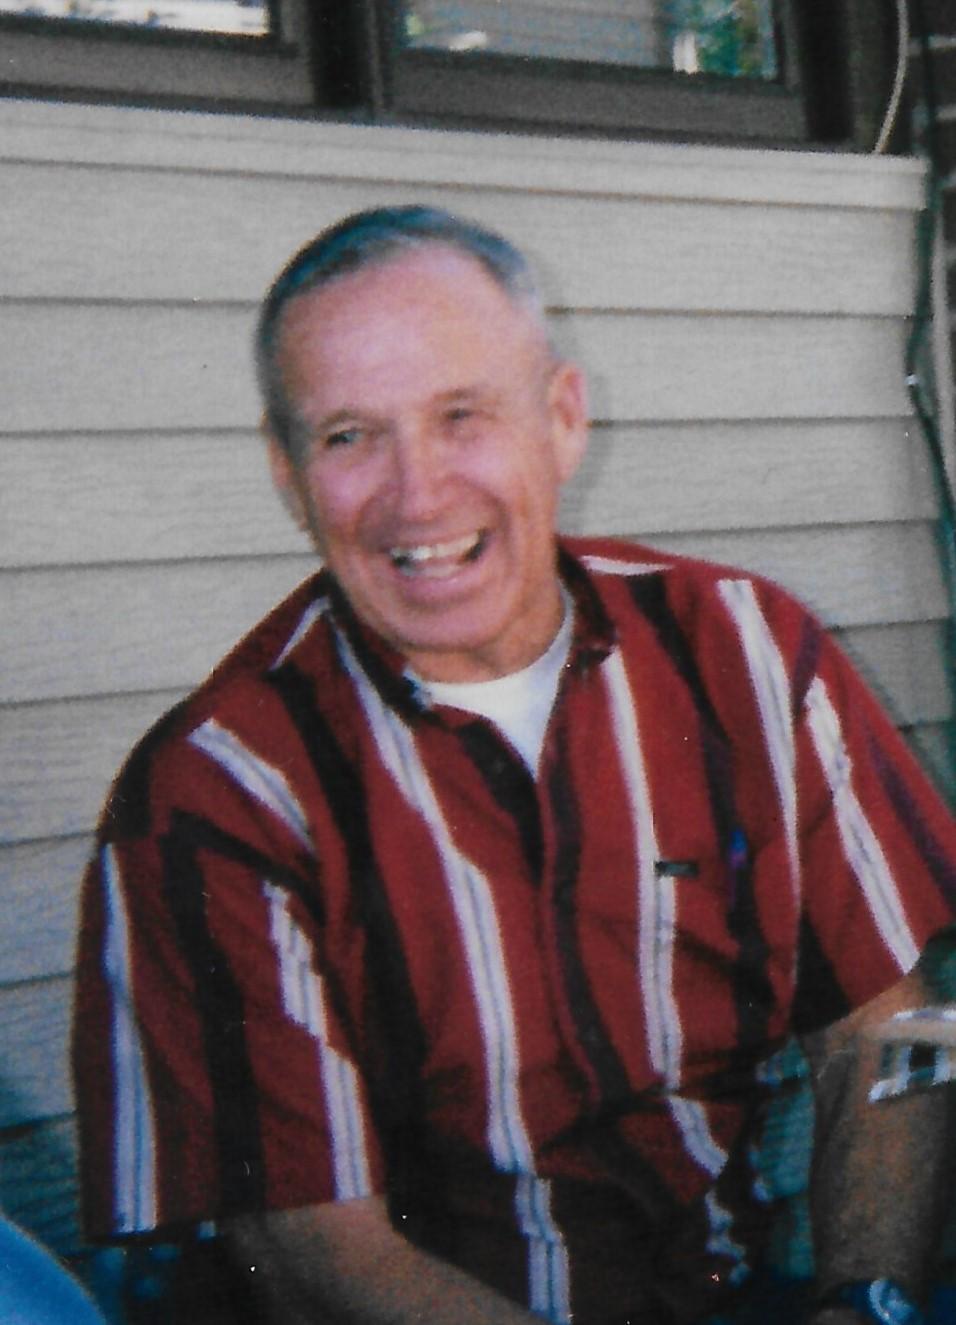 John Eberspecher, 81, Harrison